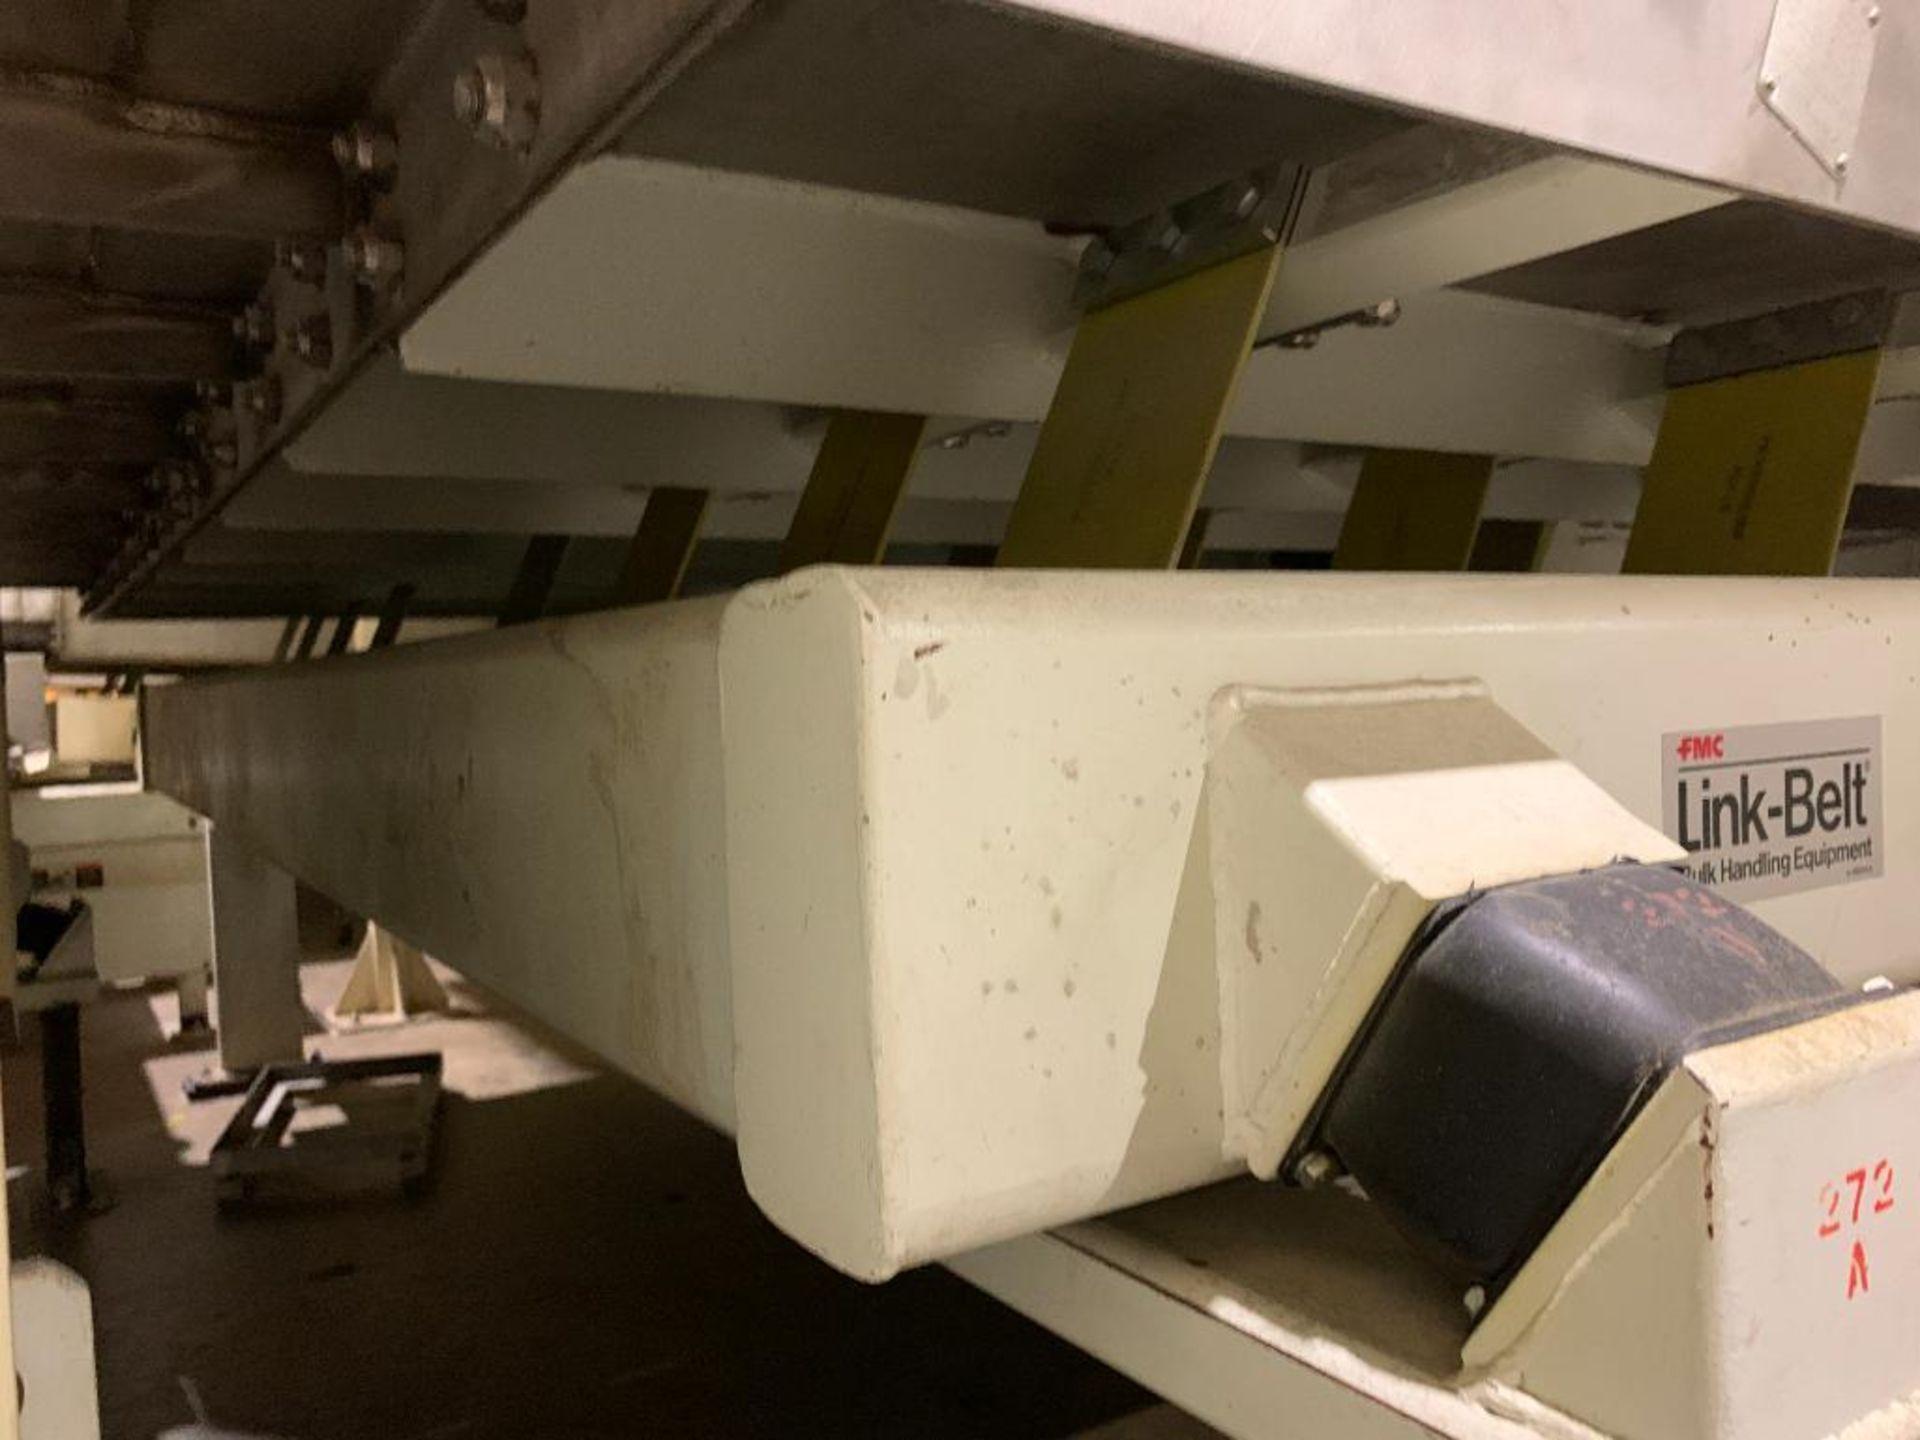 Link-Belt vibratory conveyor - Image 5 of 13